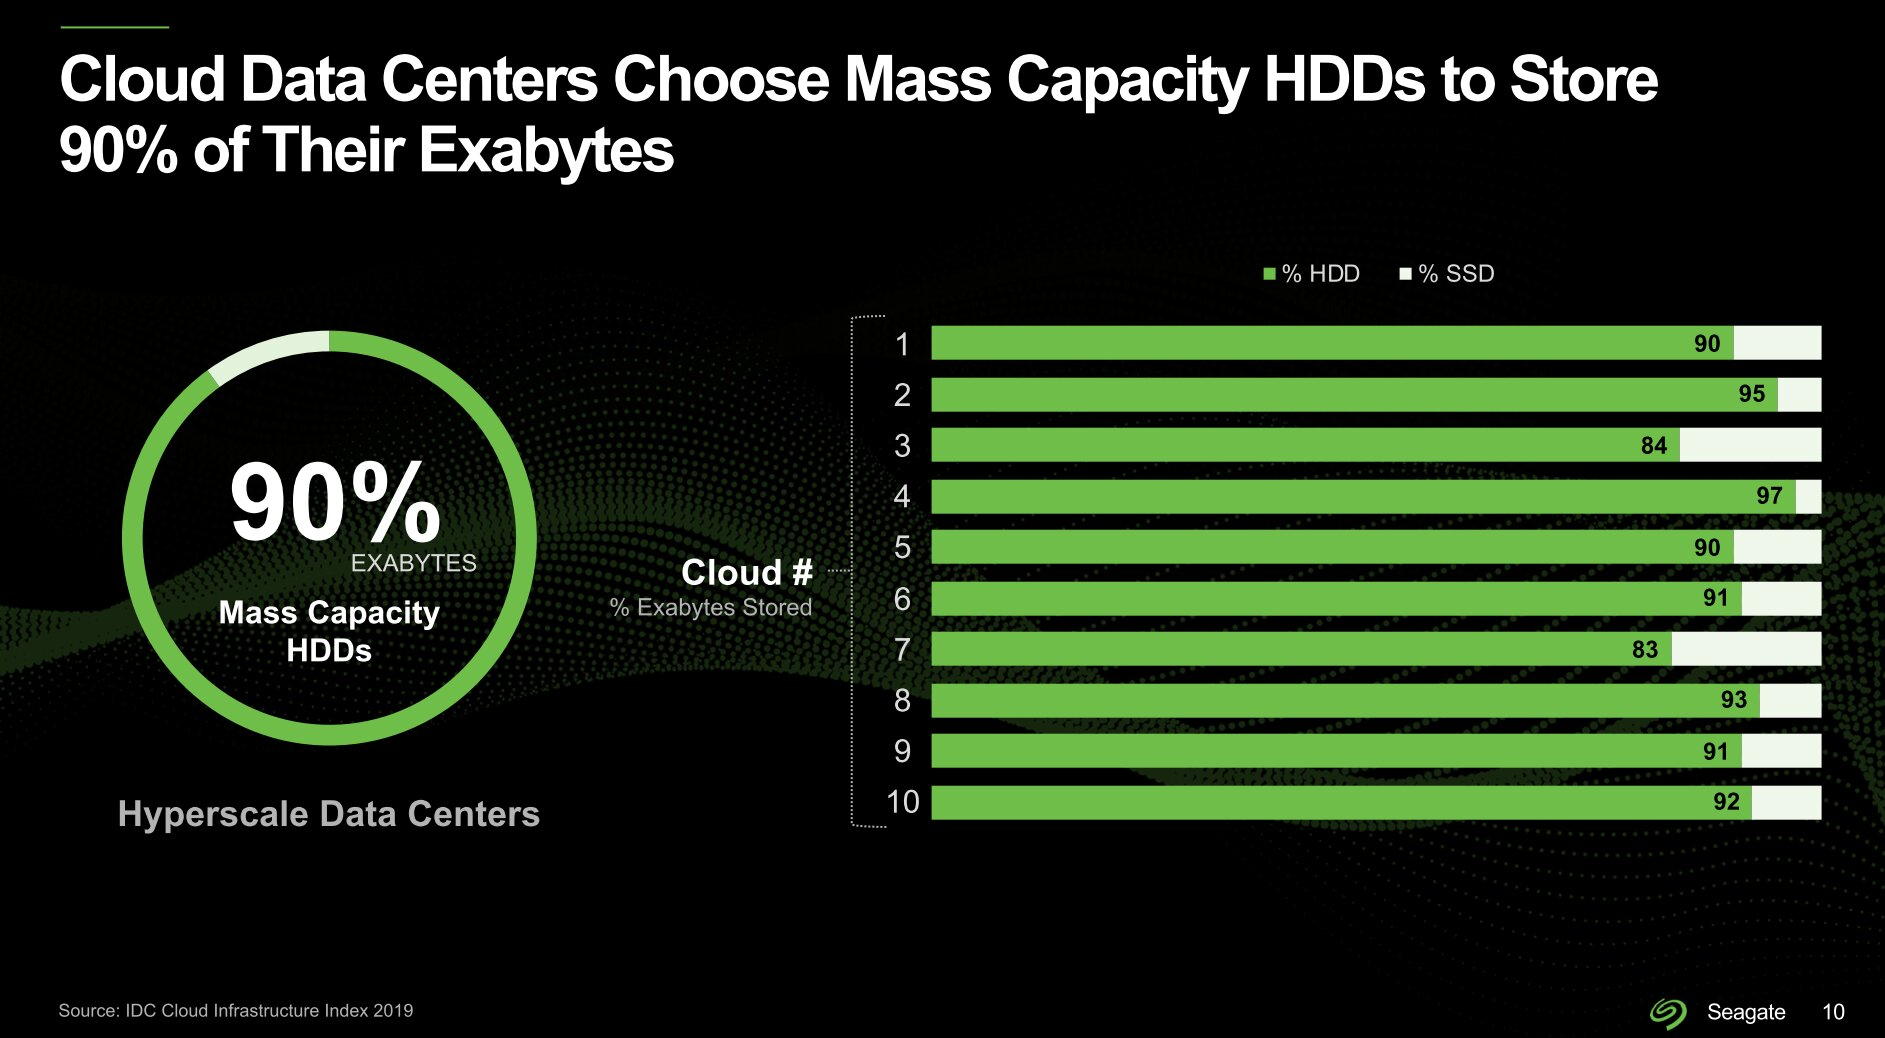 HDD dominiert bei Cloud-Anbietern